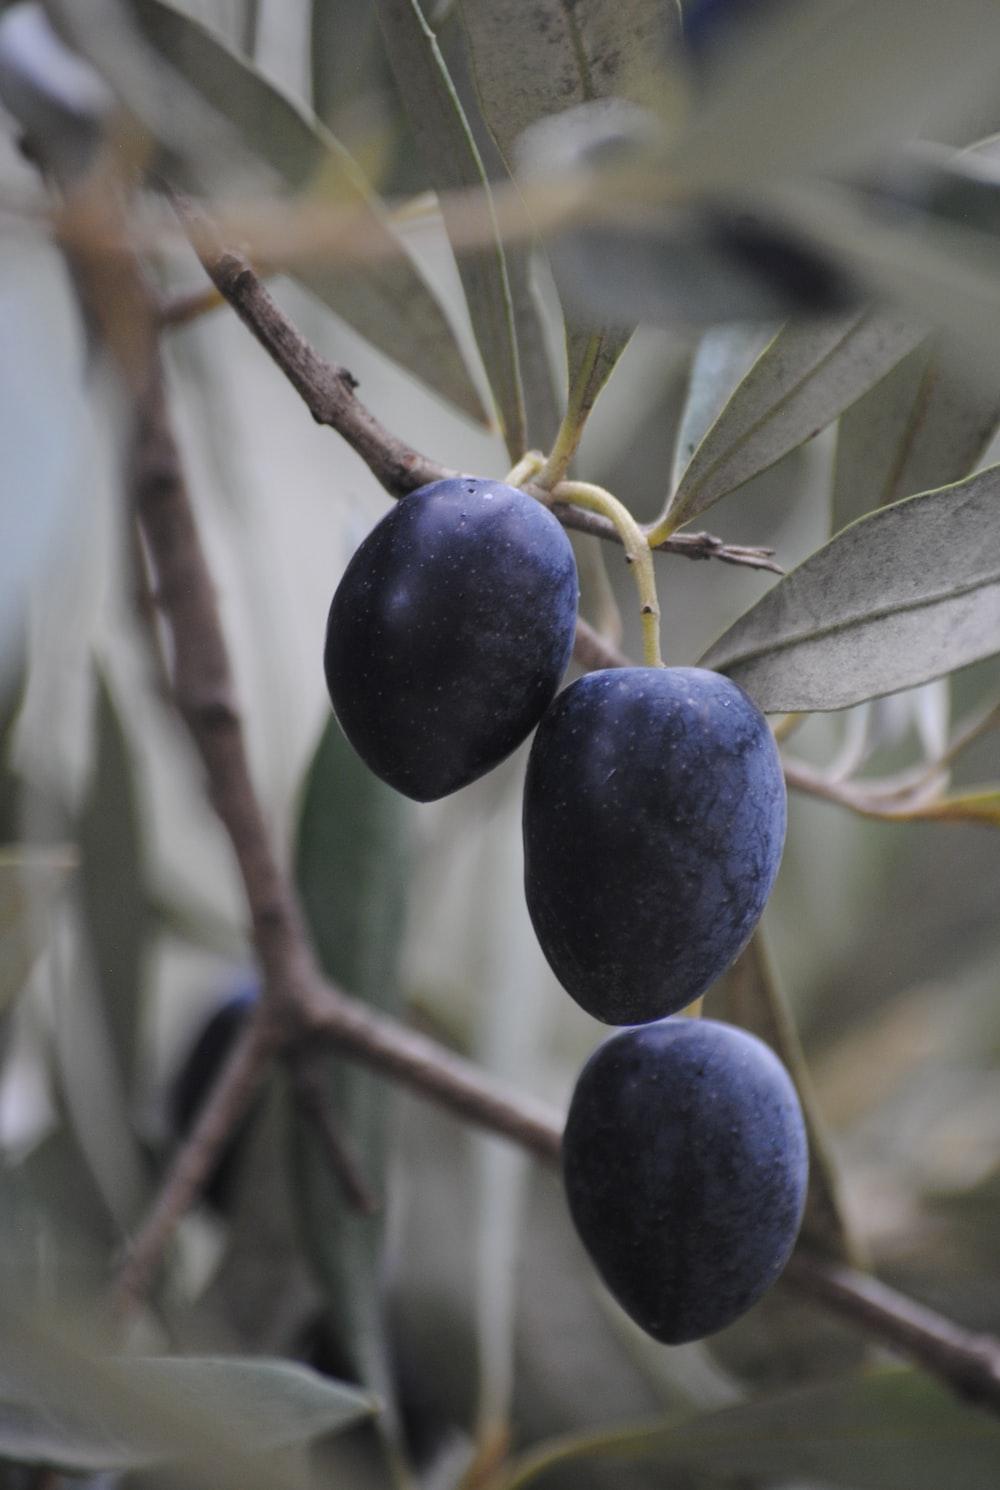 blue round fruit on tree branch